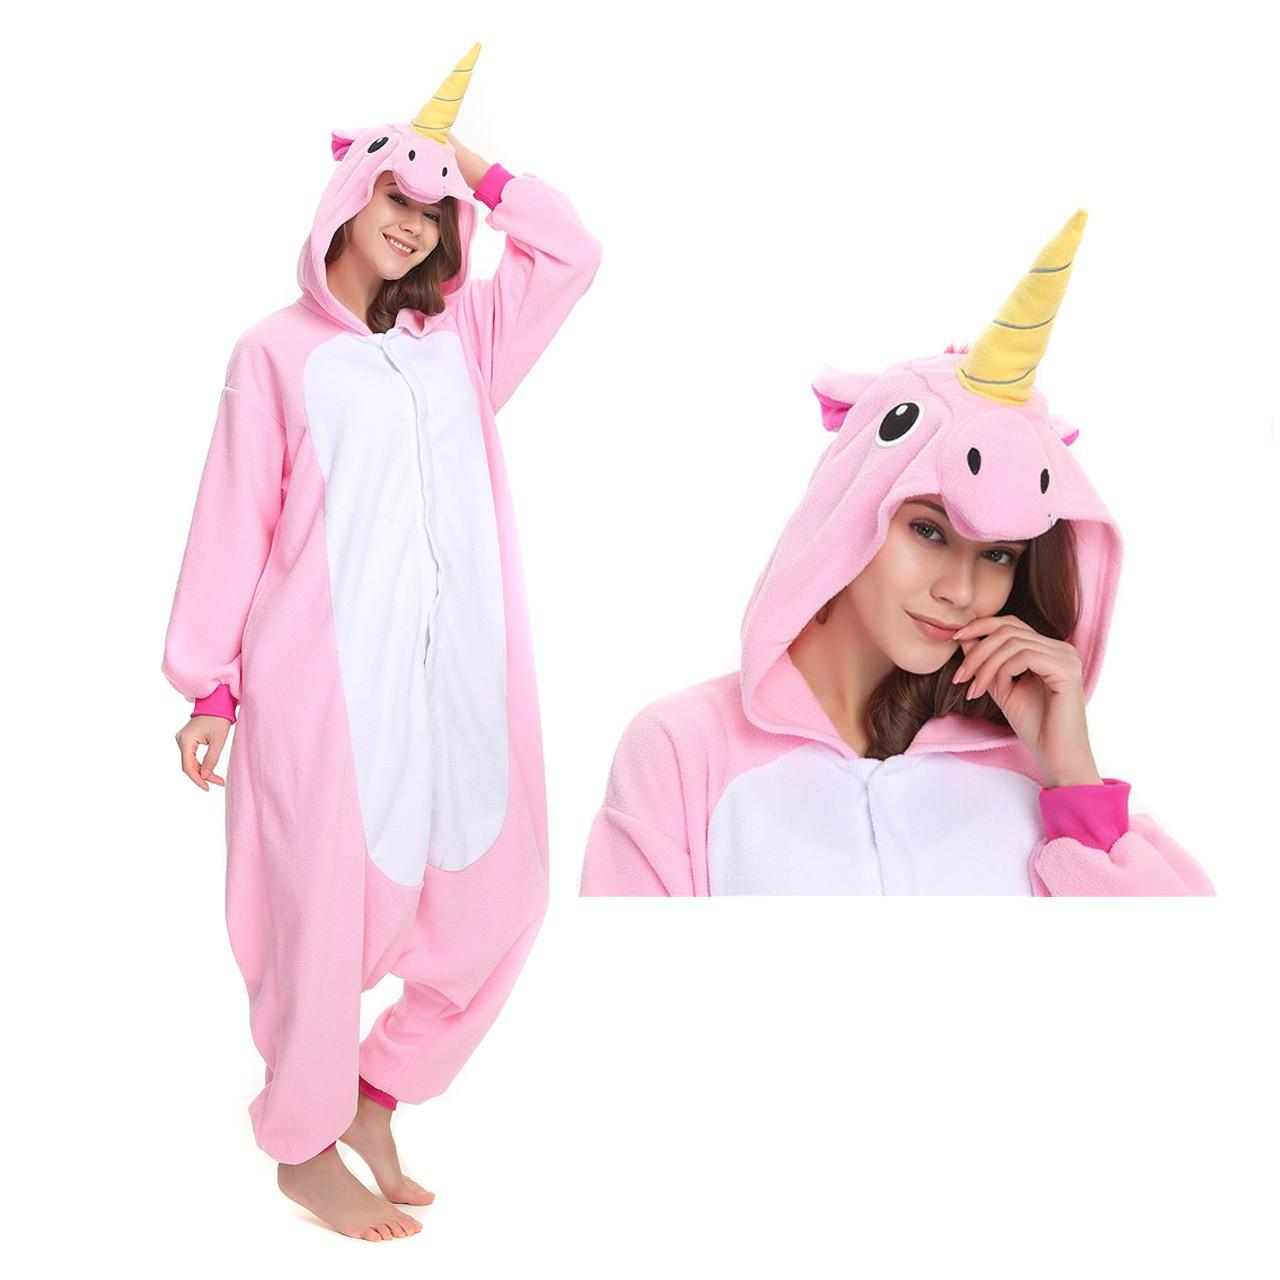 8a9d6cf1ddda Pink Unicorn Onesie for Adult Kigurumi Pajama Party Costumes